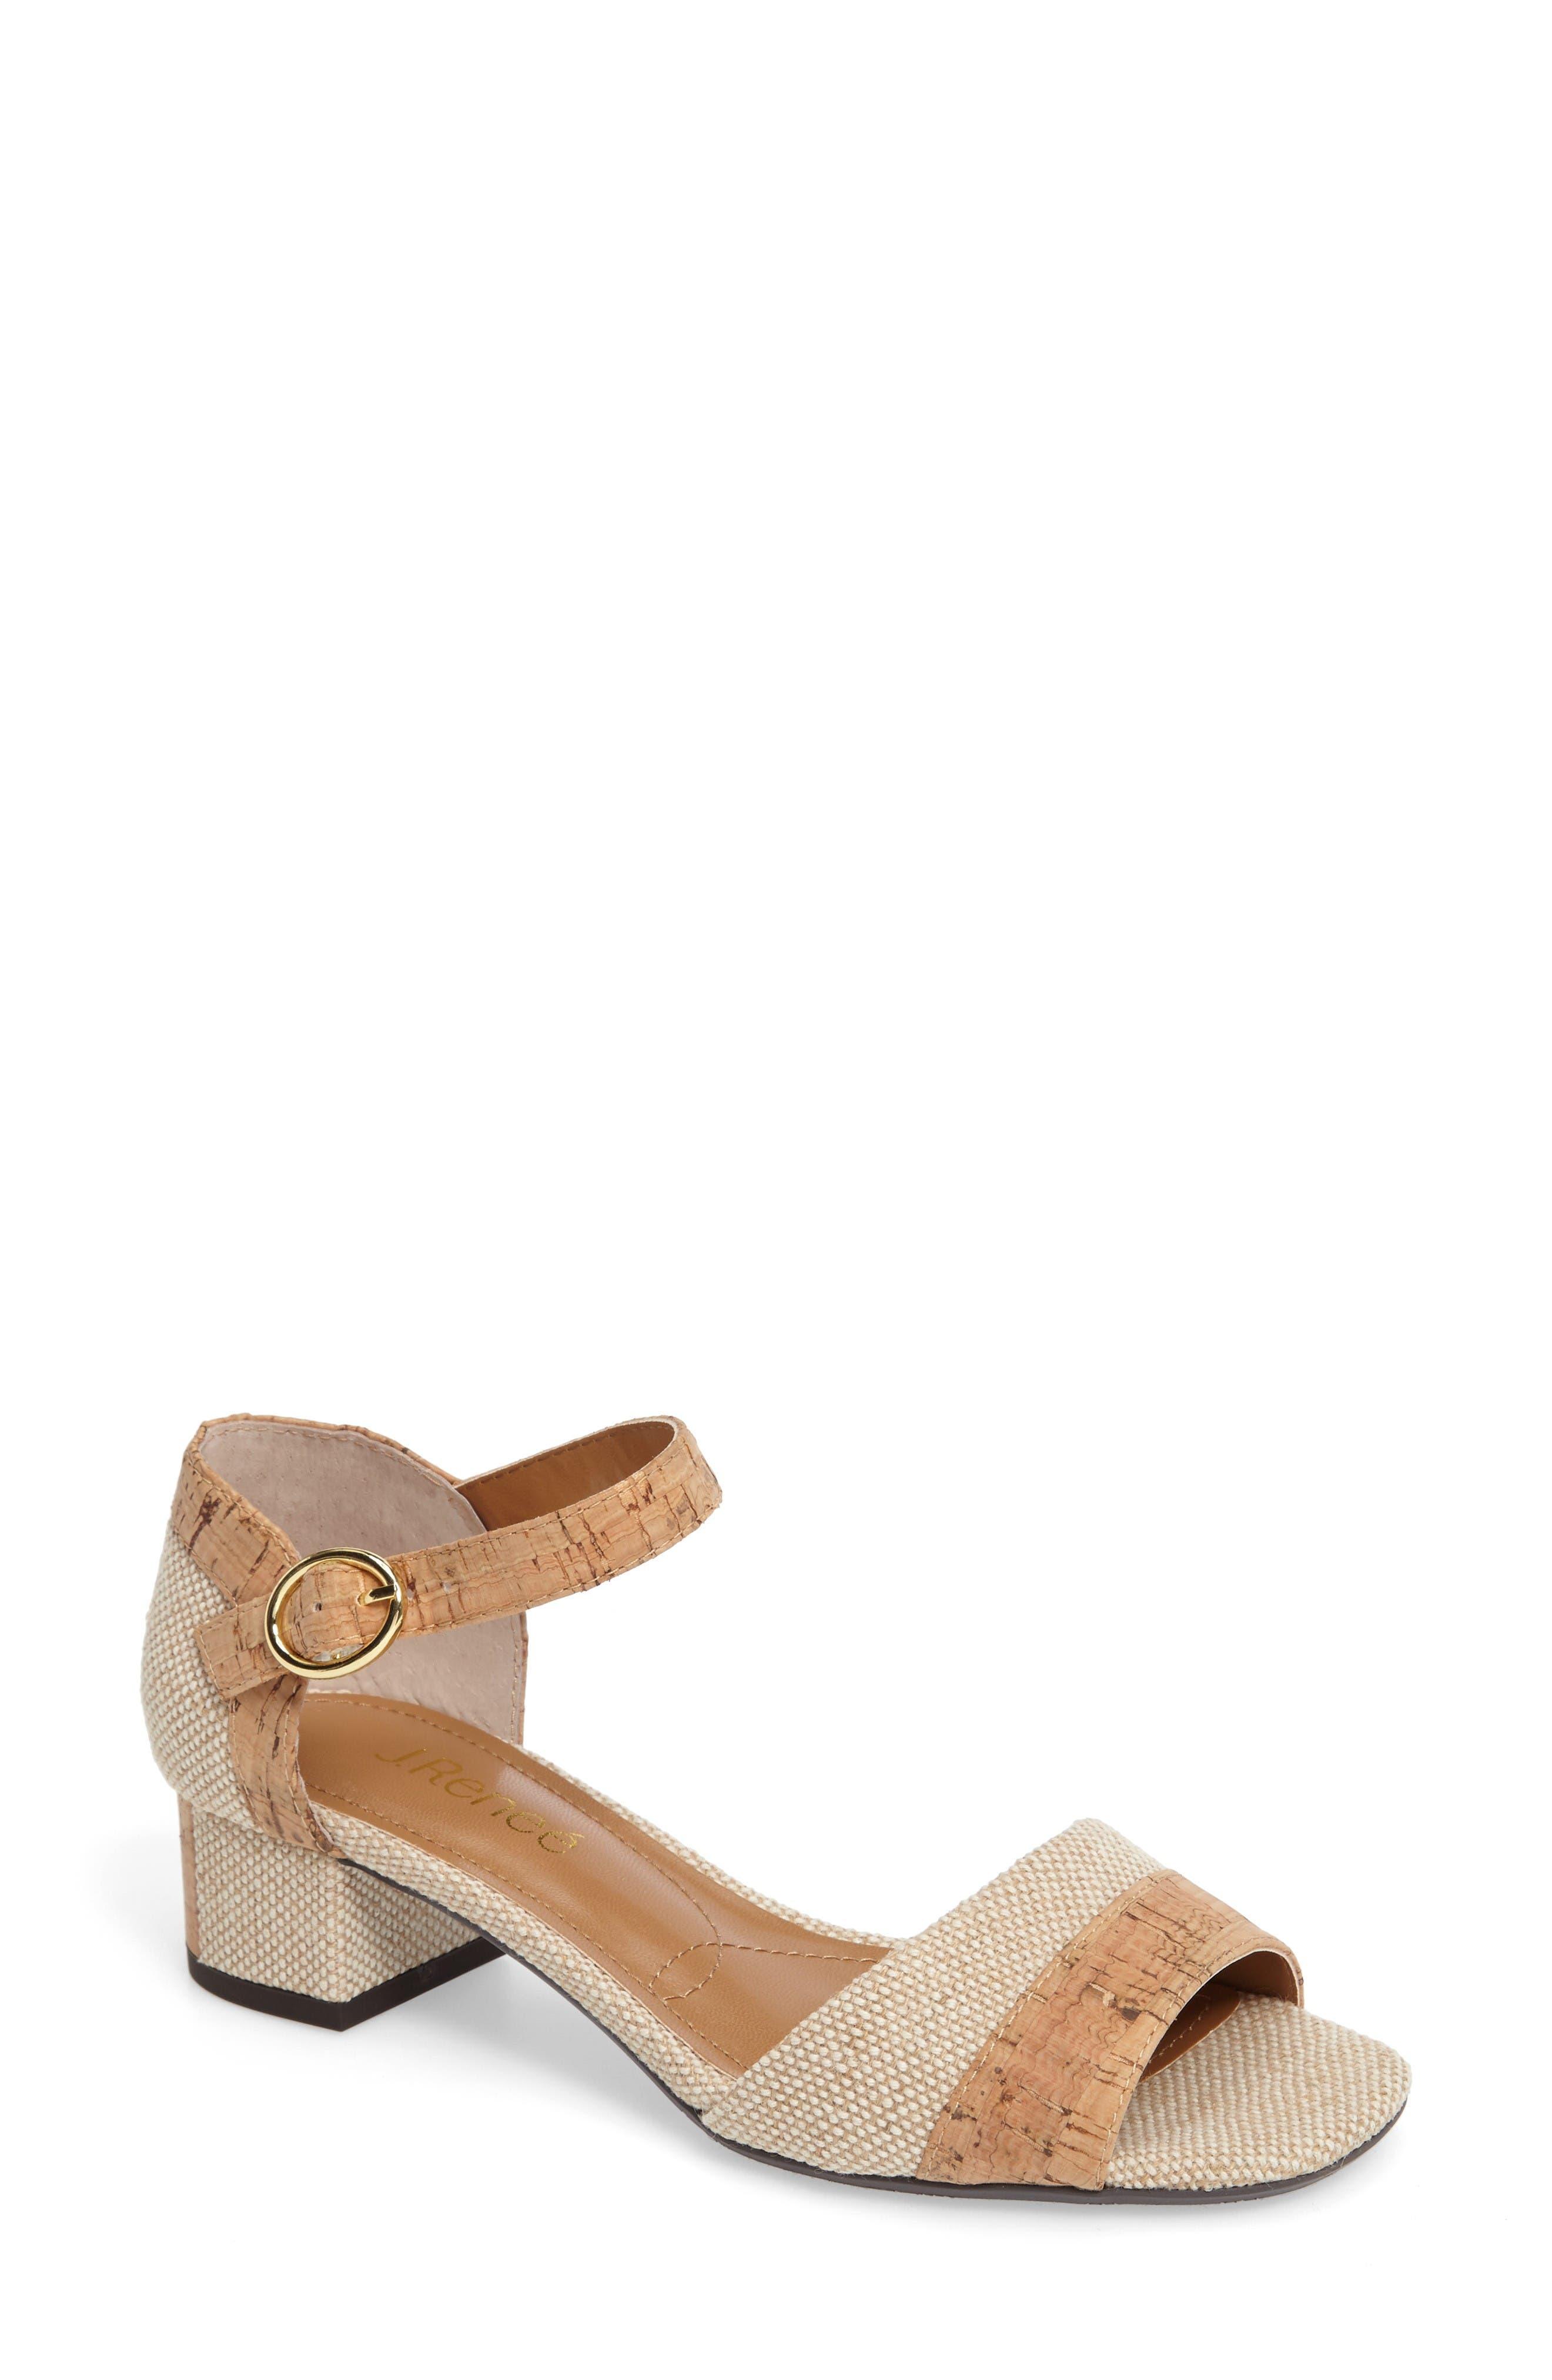 Pebblebeach Block Heel Sandal,                         Main,                         color, Natural/ Cork Fabric